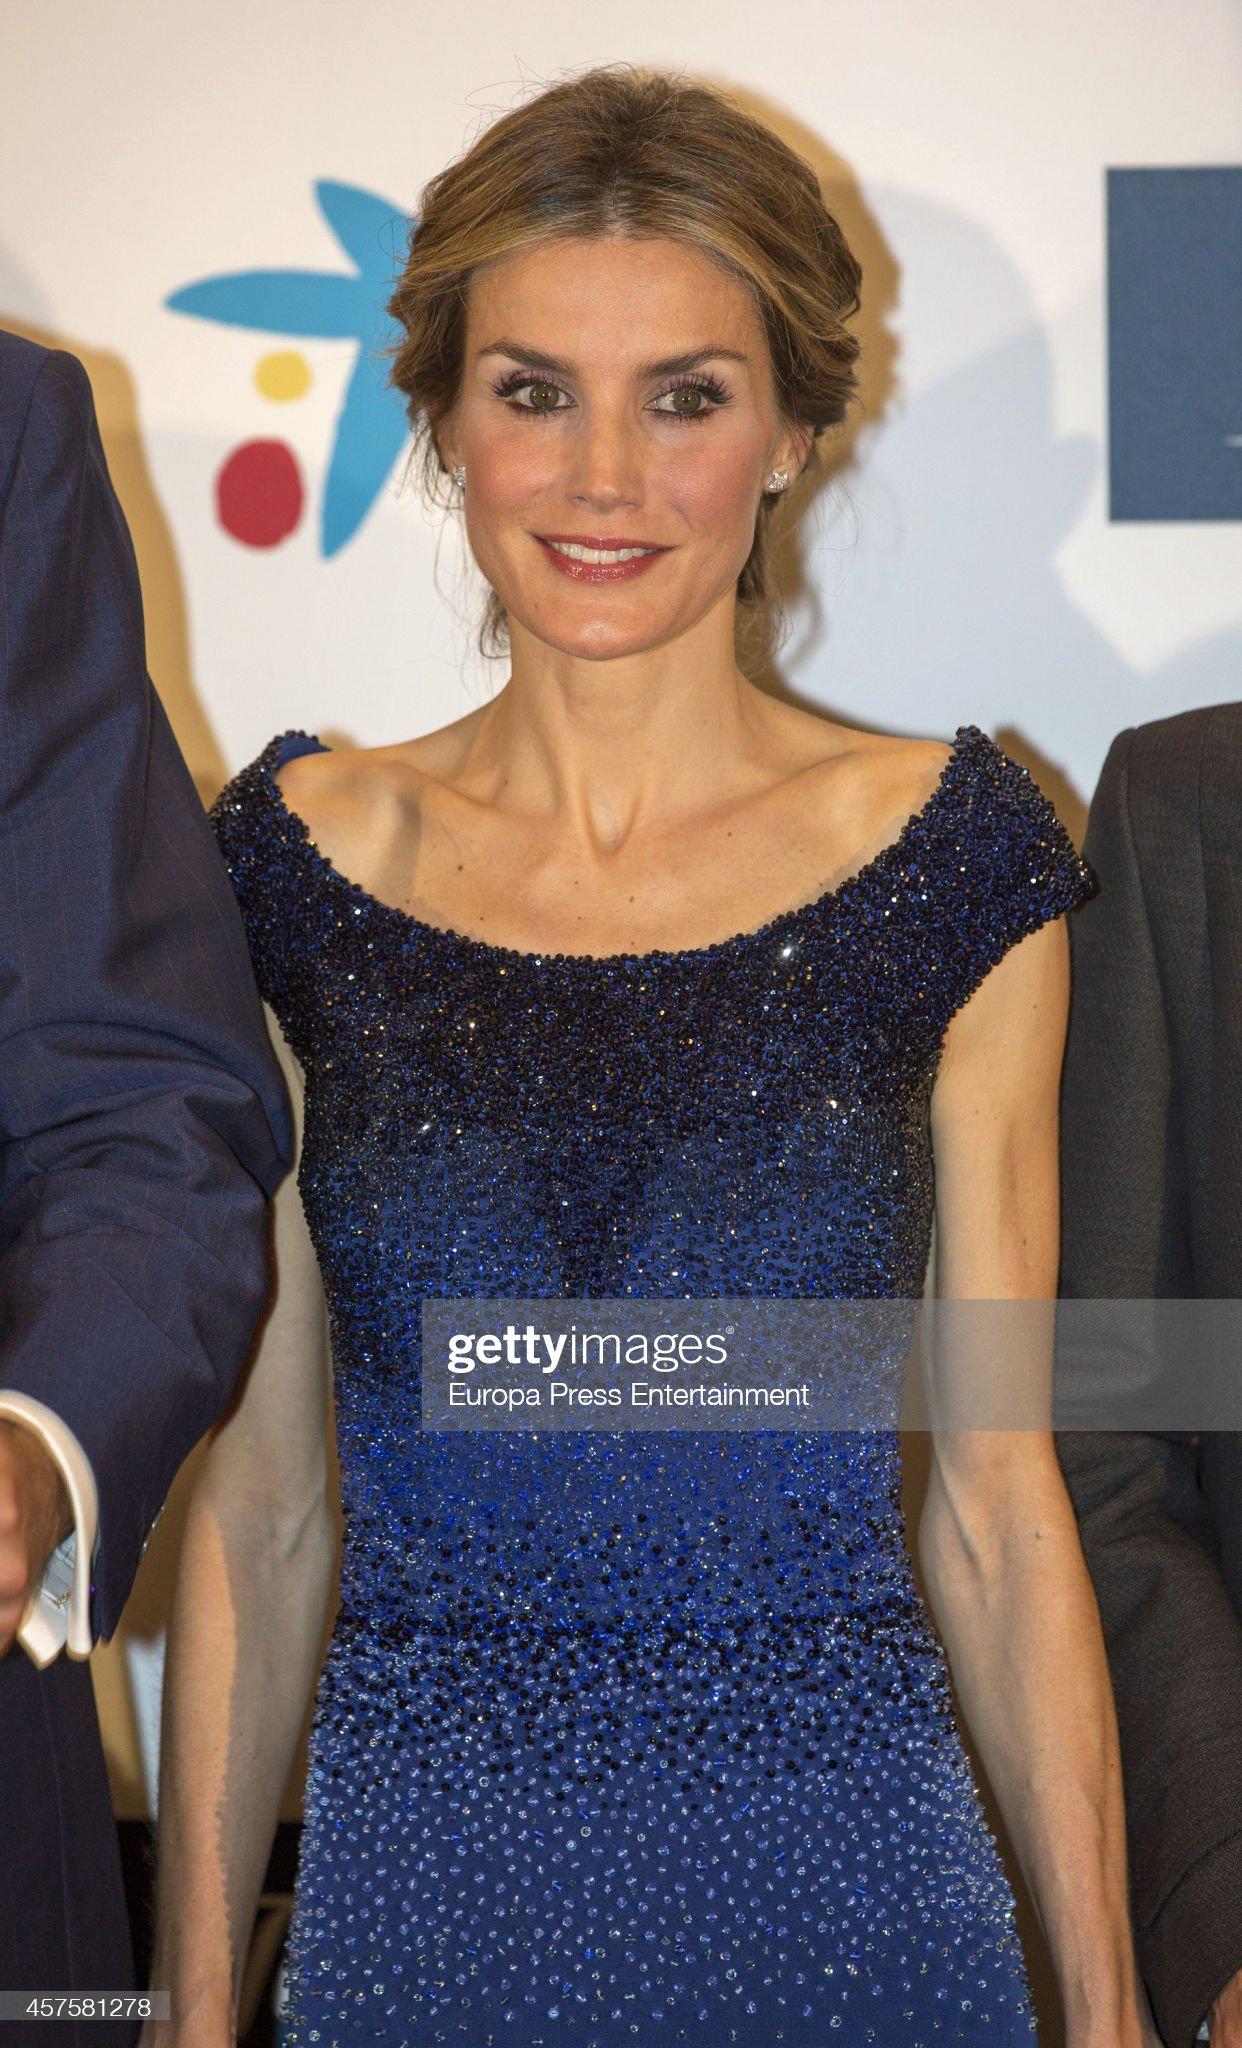 Spanish Royals Attend International Journalism Award : News Photo